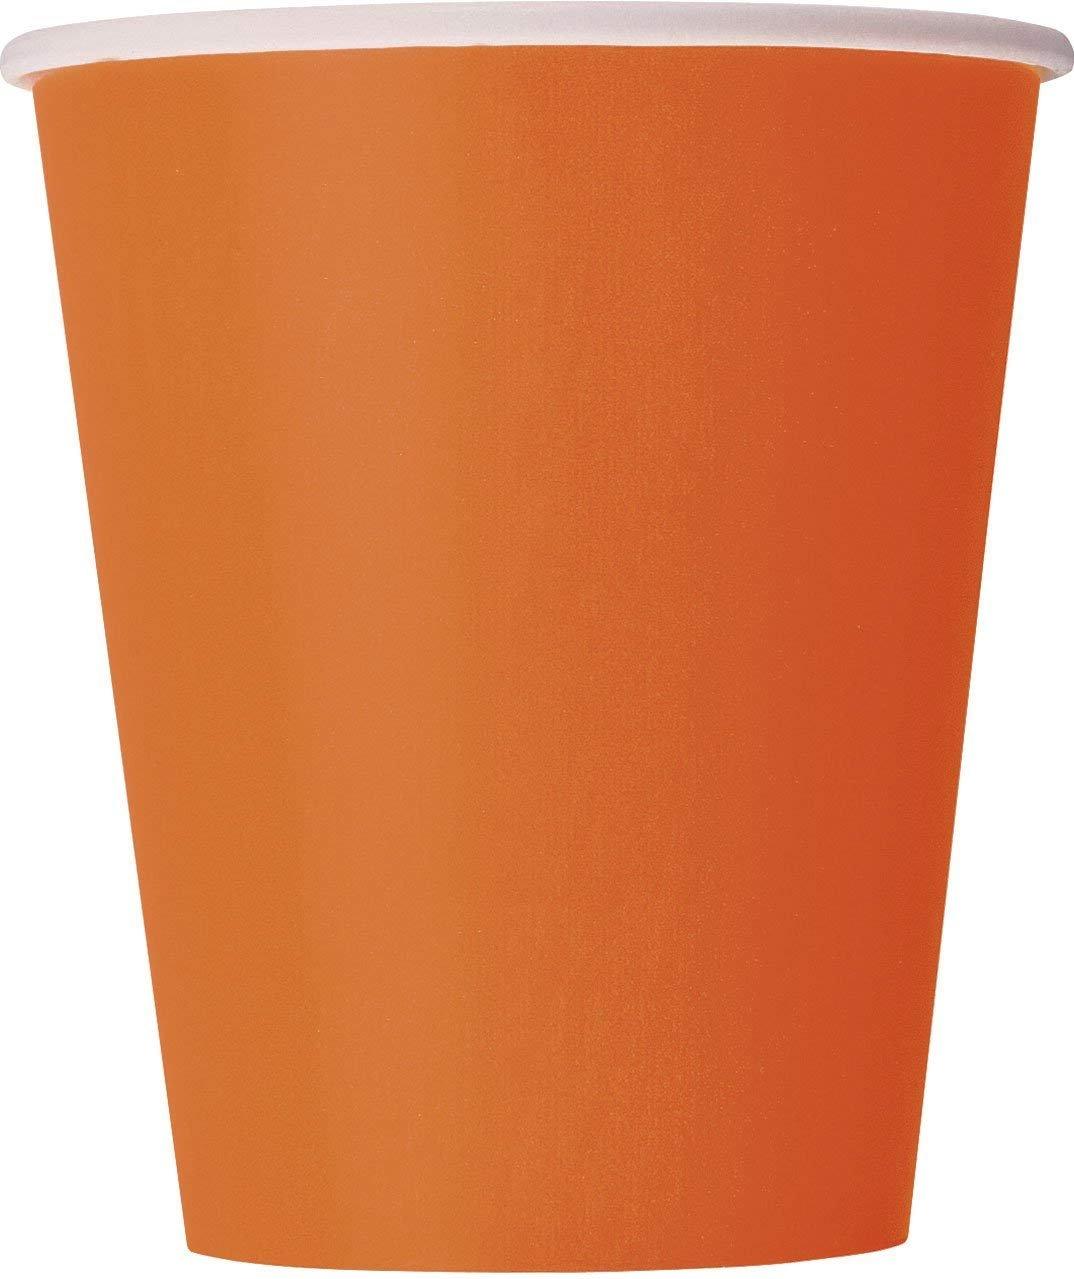 270 ml Orange Paper Cups, Pack of 28 Unique Party